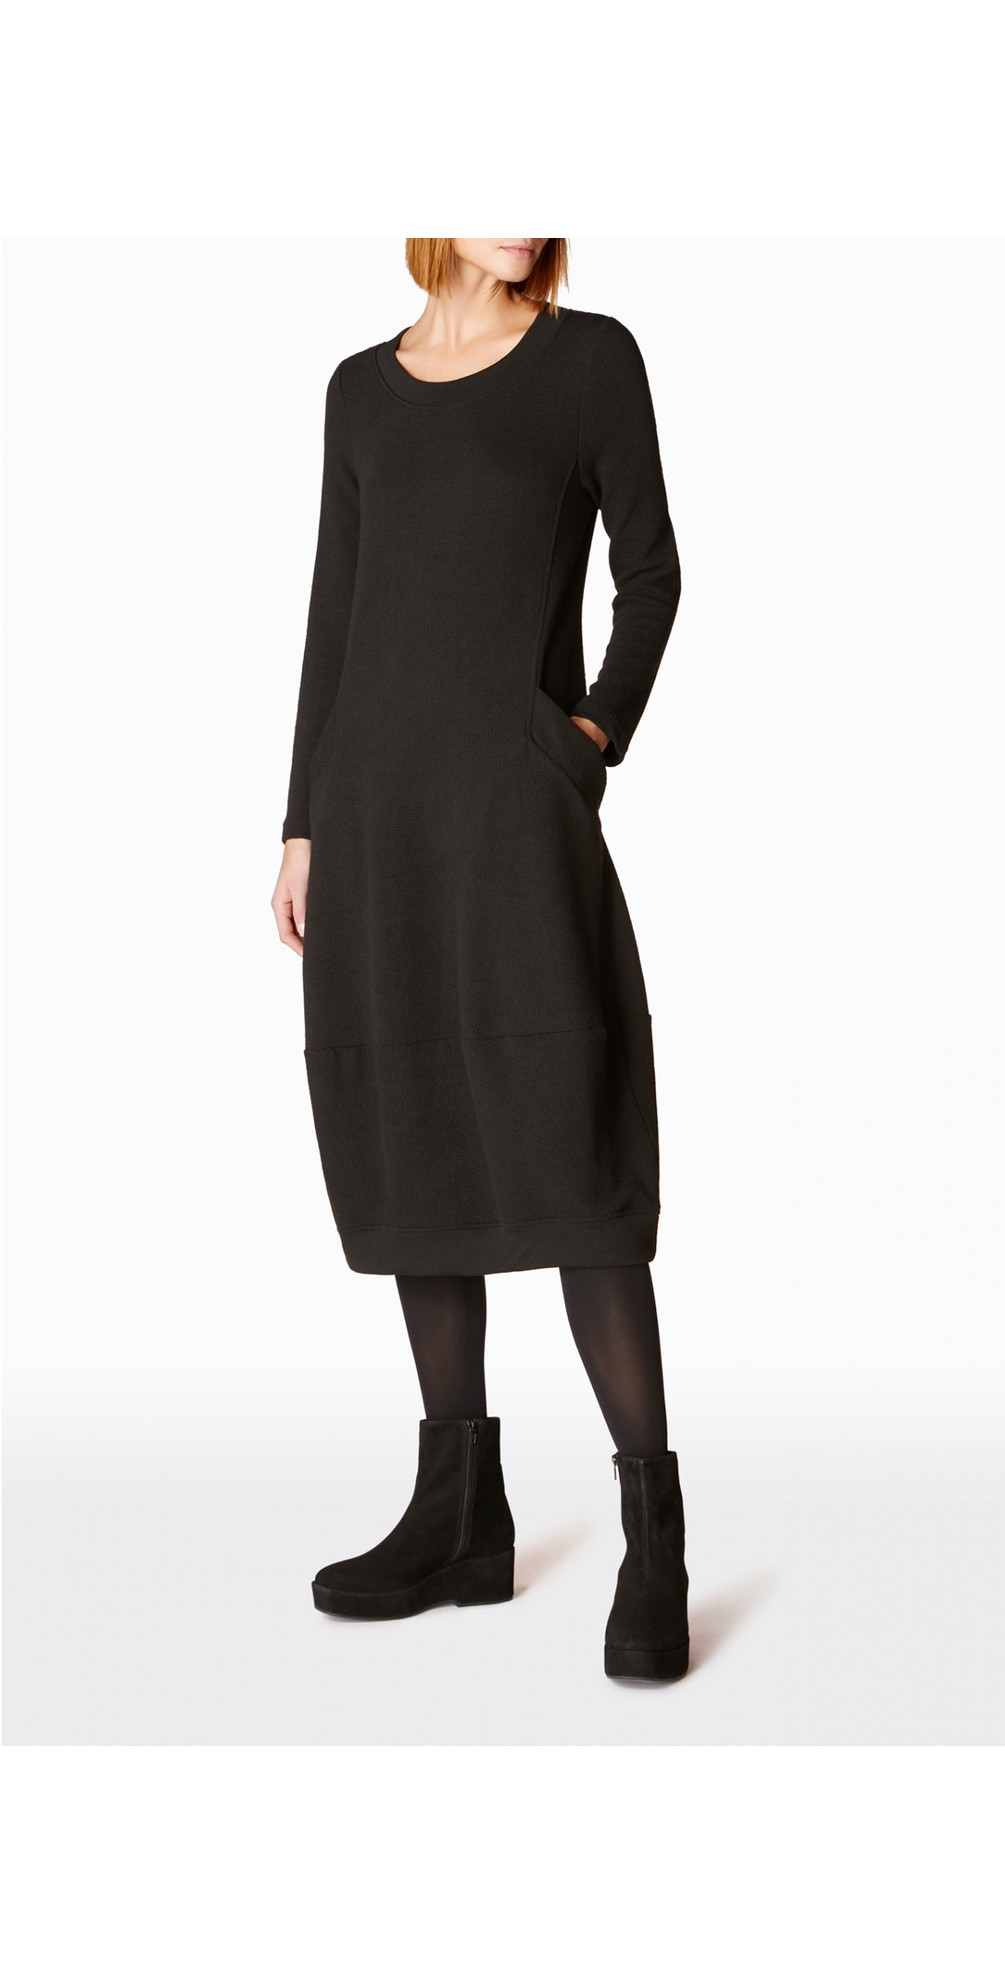 Textured Jersey Bubble Dress main image